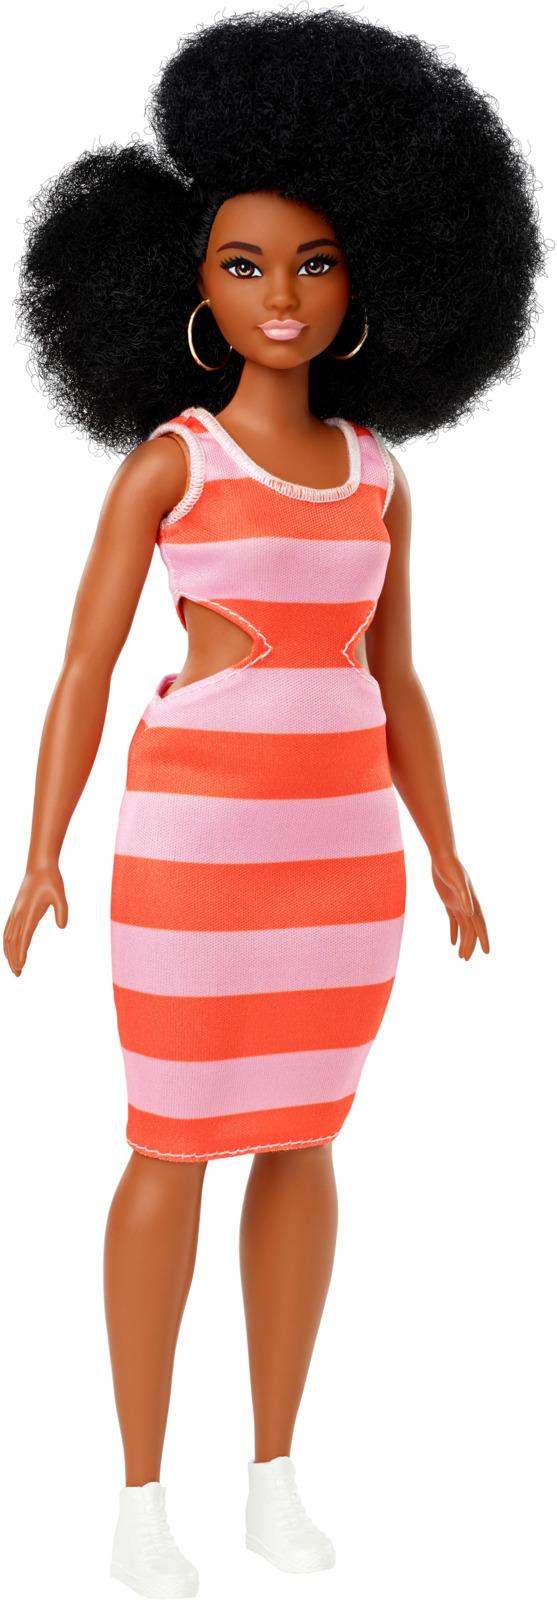 Barbie Кукла Fashionistas № 105_FBR37_FXL45 кукла barbie fashionistas 61